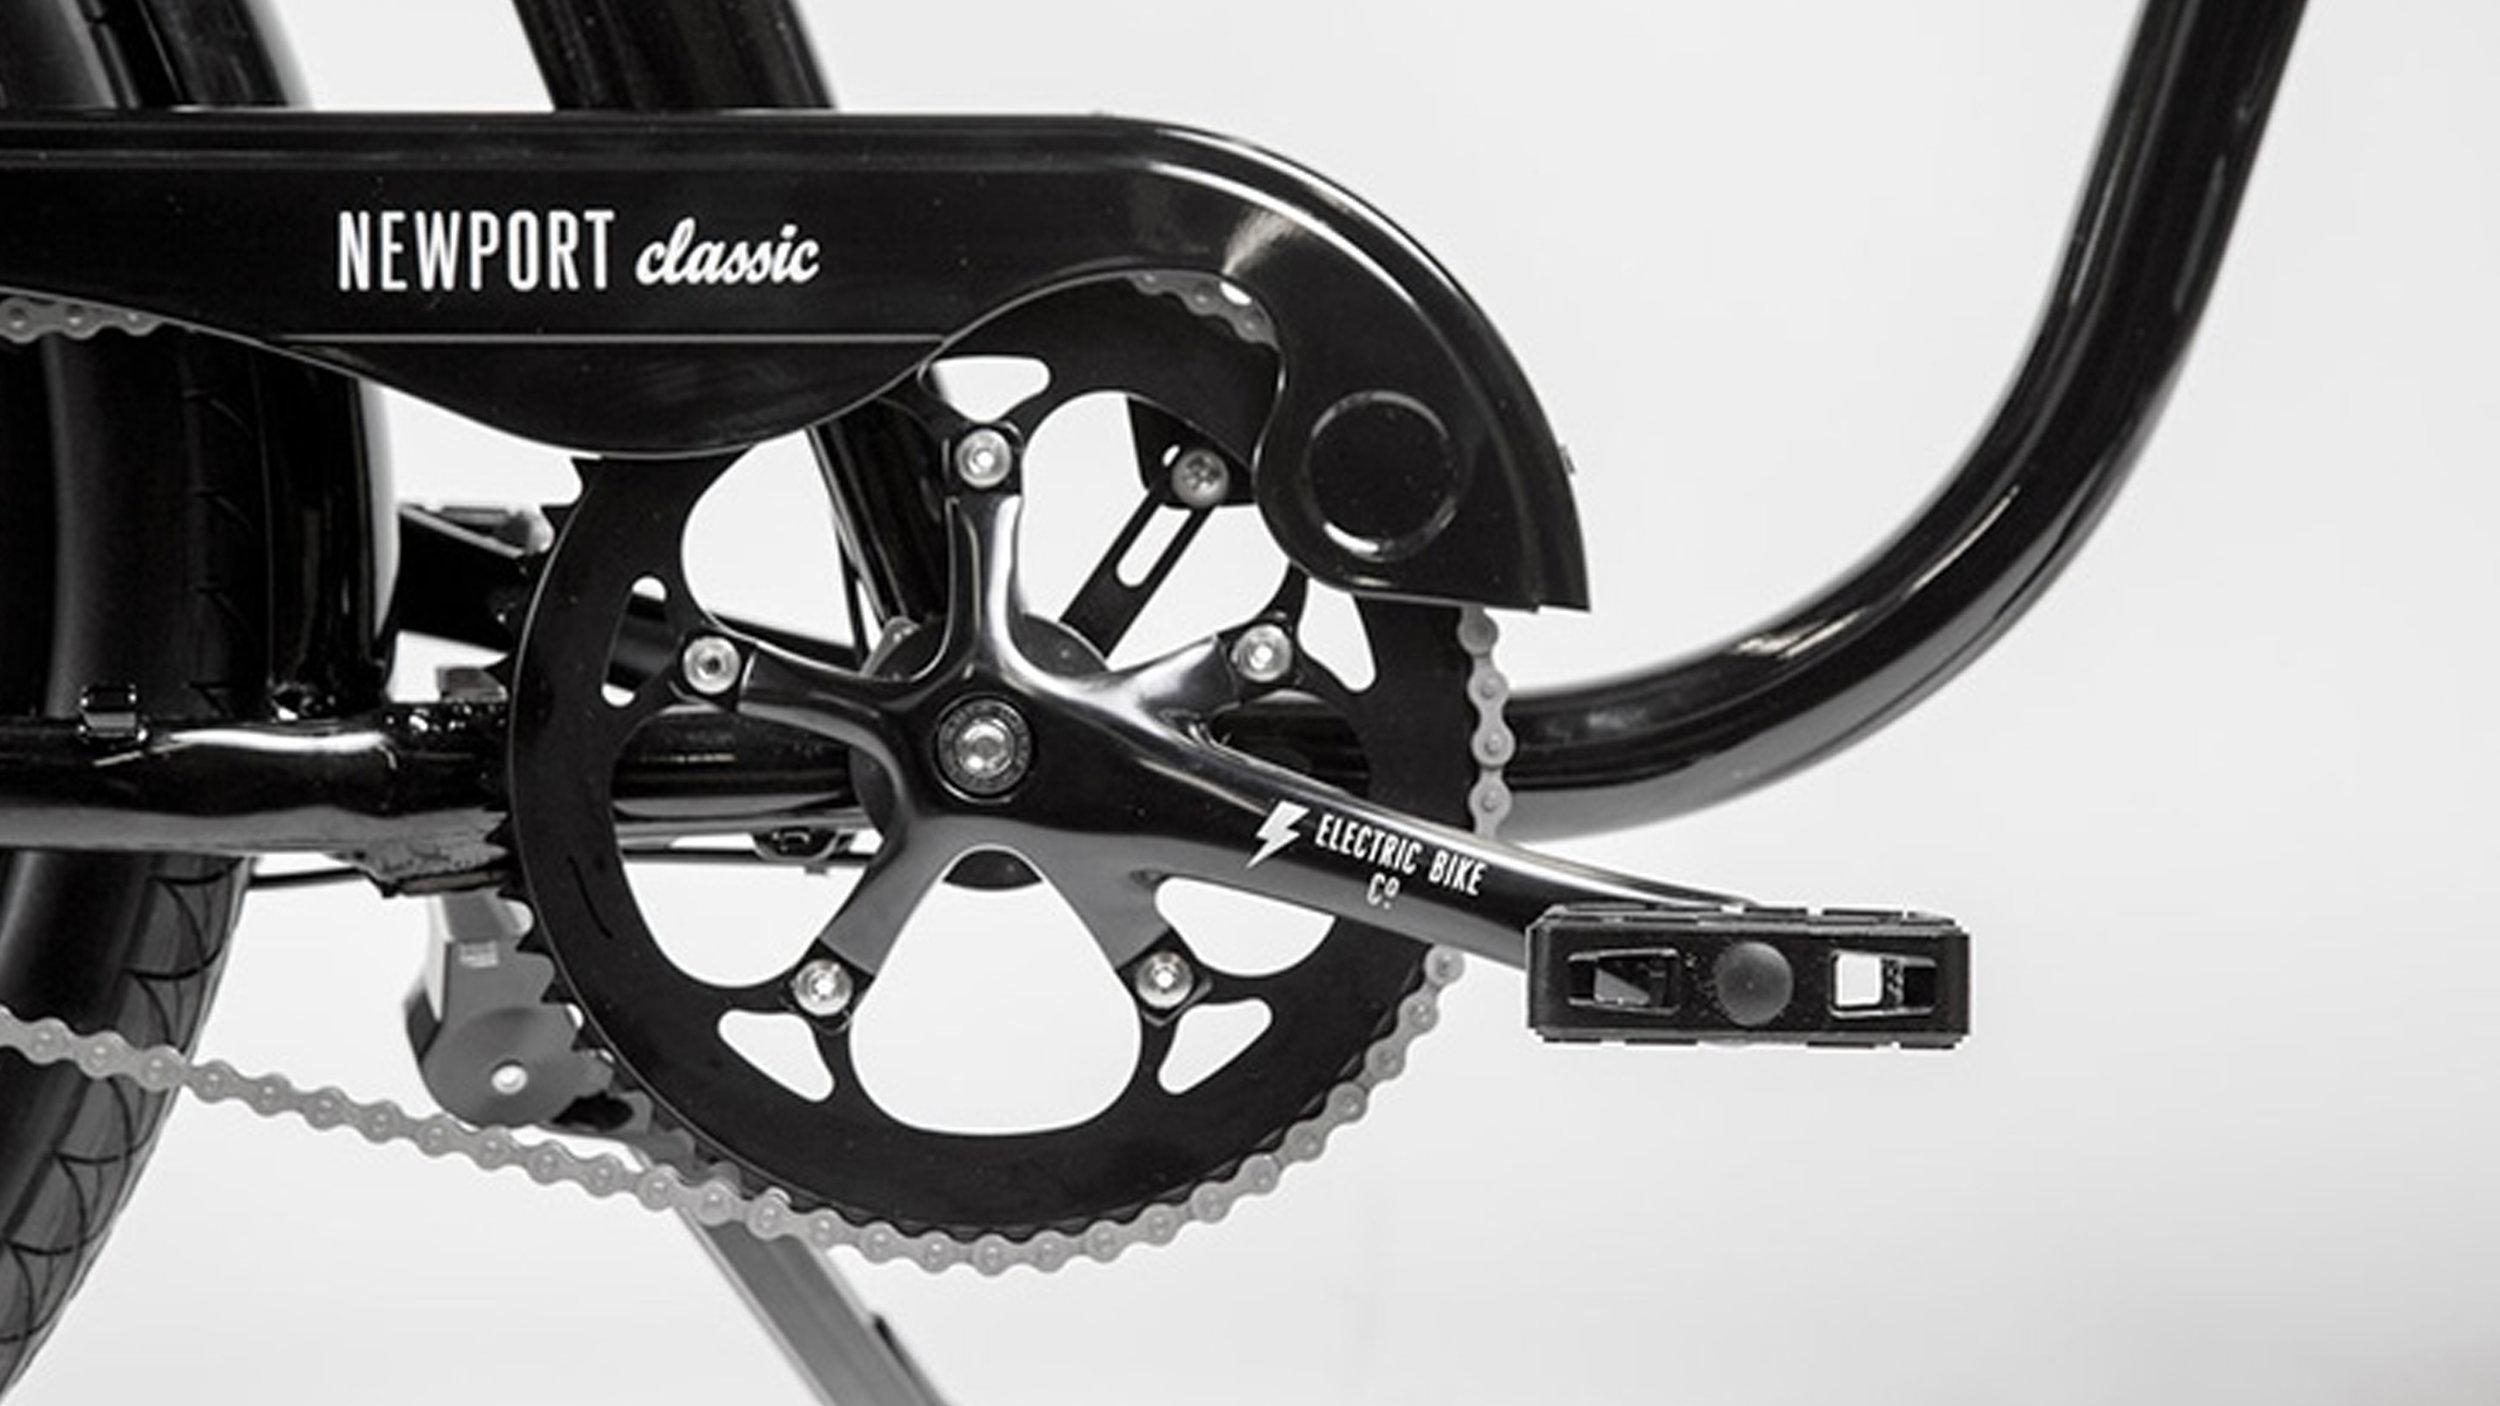 electrified-reviews-electric-bike-company-model-c-electric-bike-review-cranks.jpg